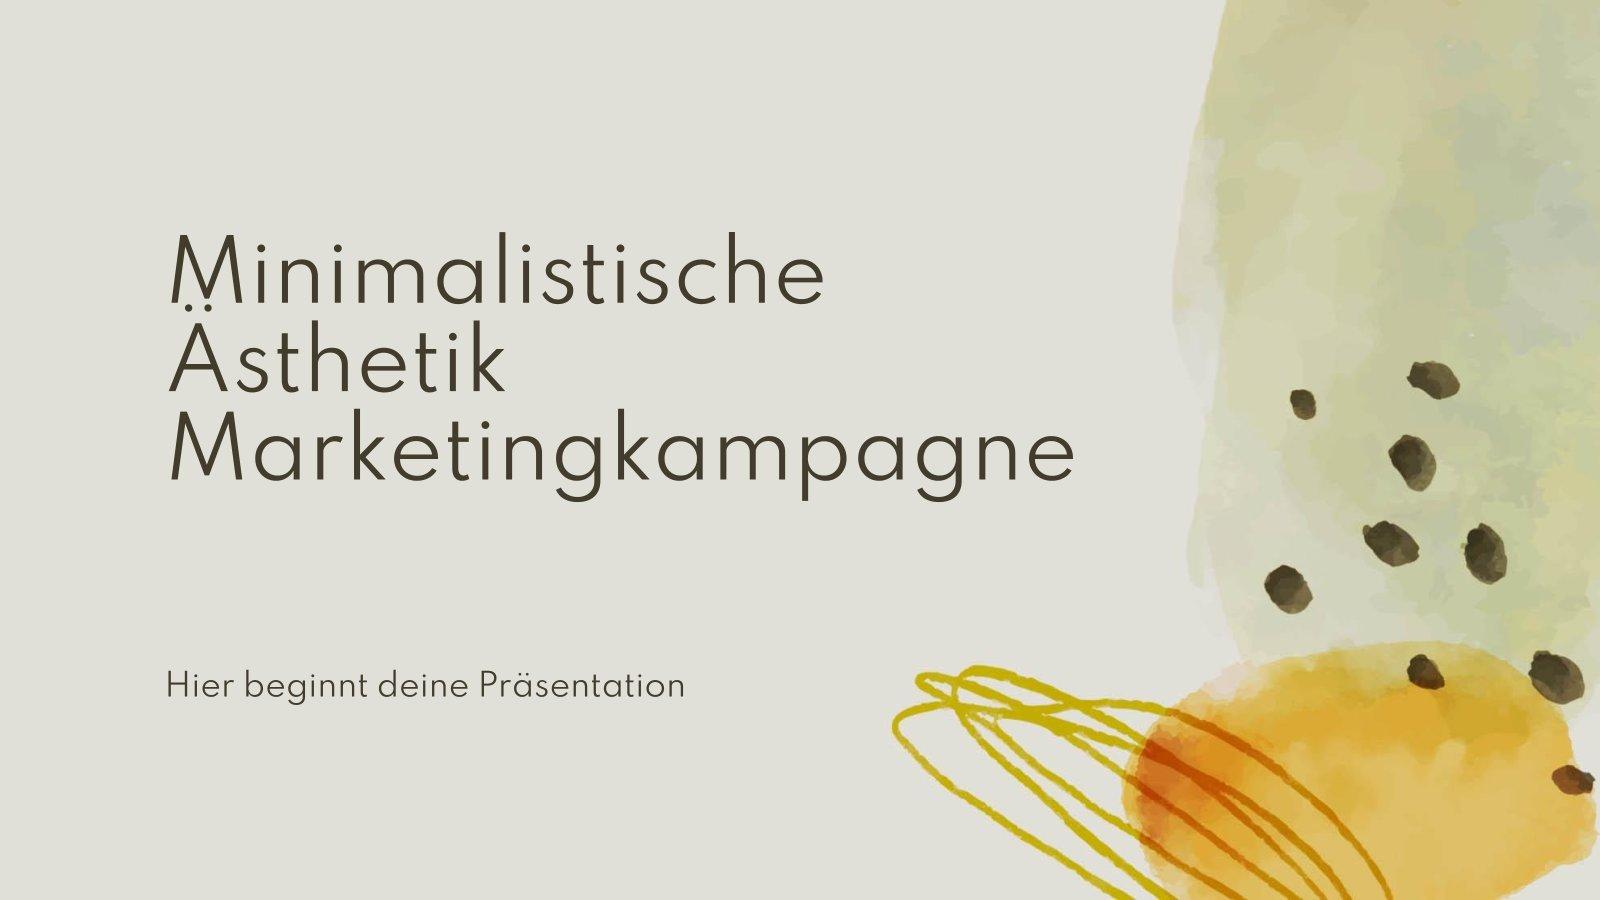 Minimalist Aesthetics Marketing Campaign presentation template